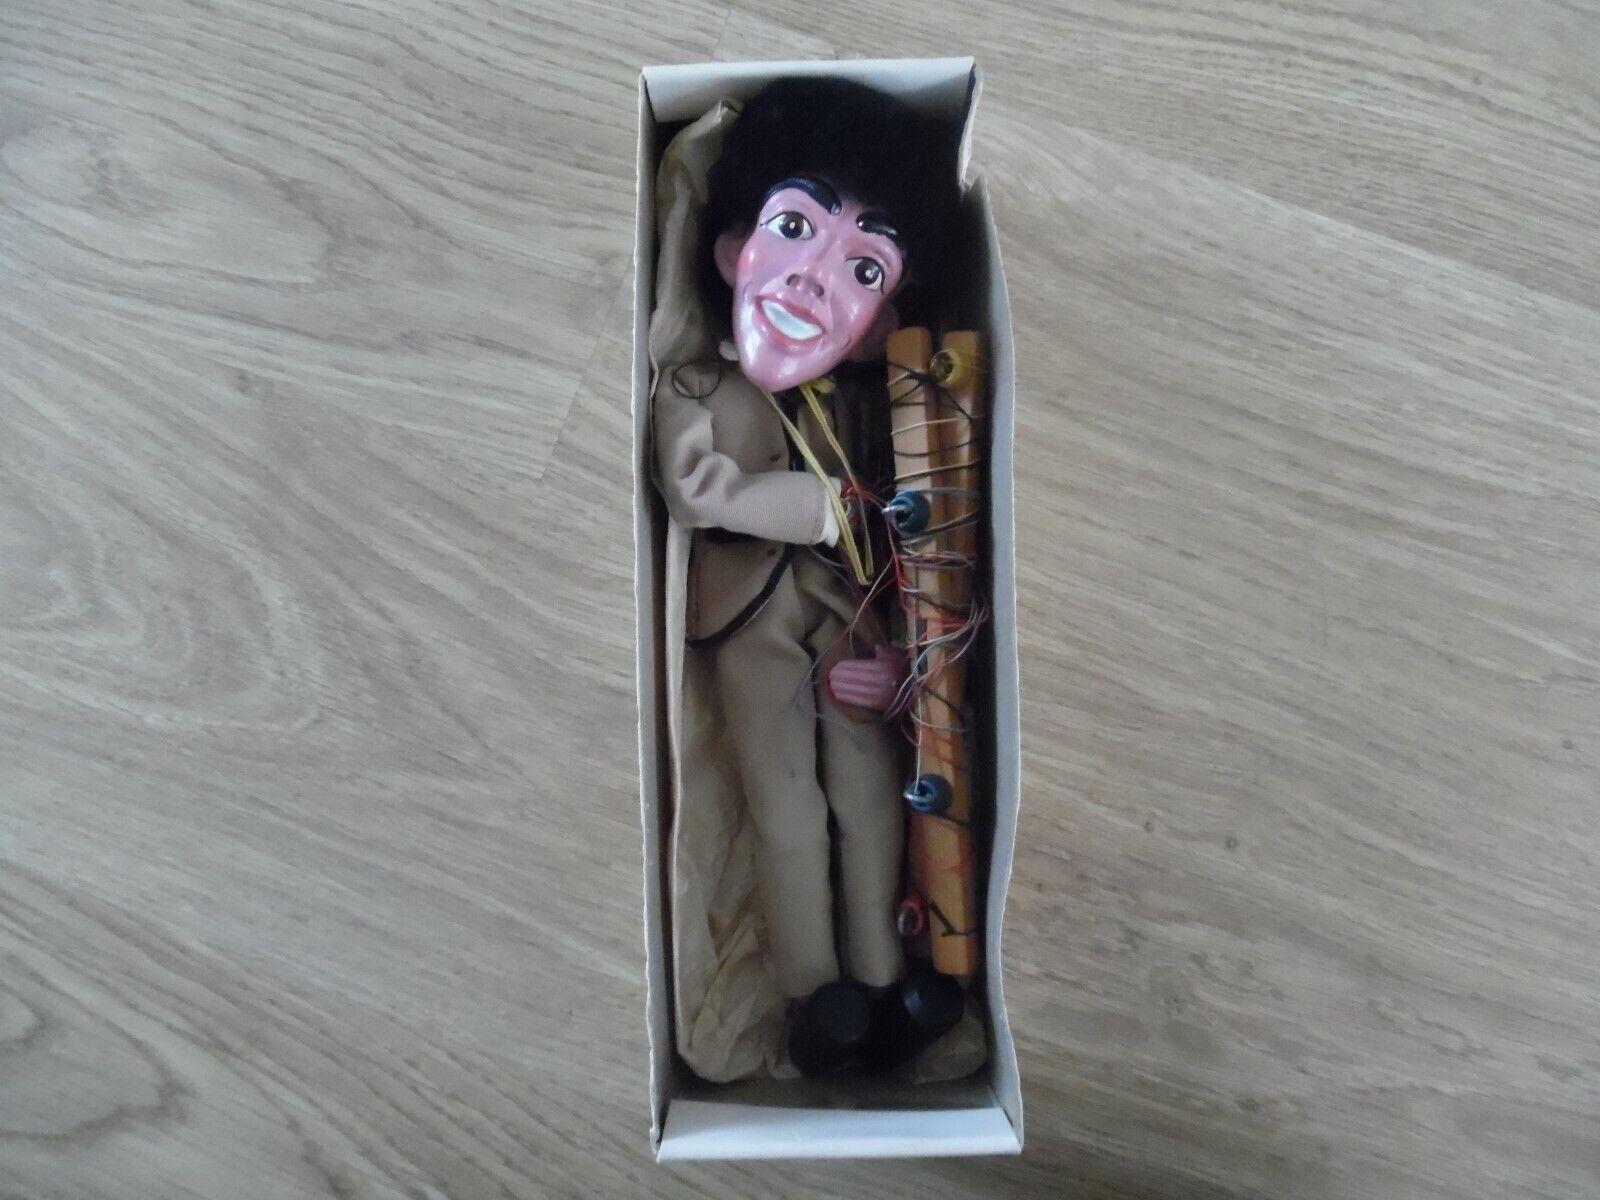 RARE VINTAGE PELHAM PUPPET NO.2 POP SINGER - BEATLES - HAND MADE - BOXED